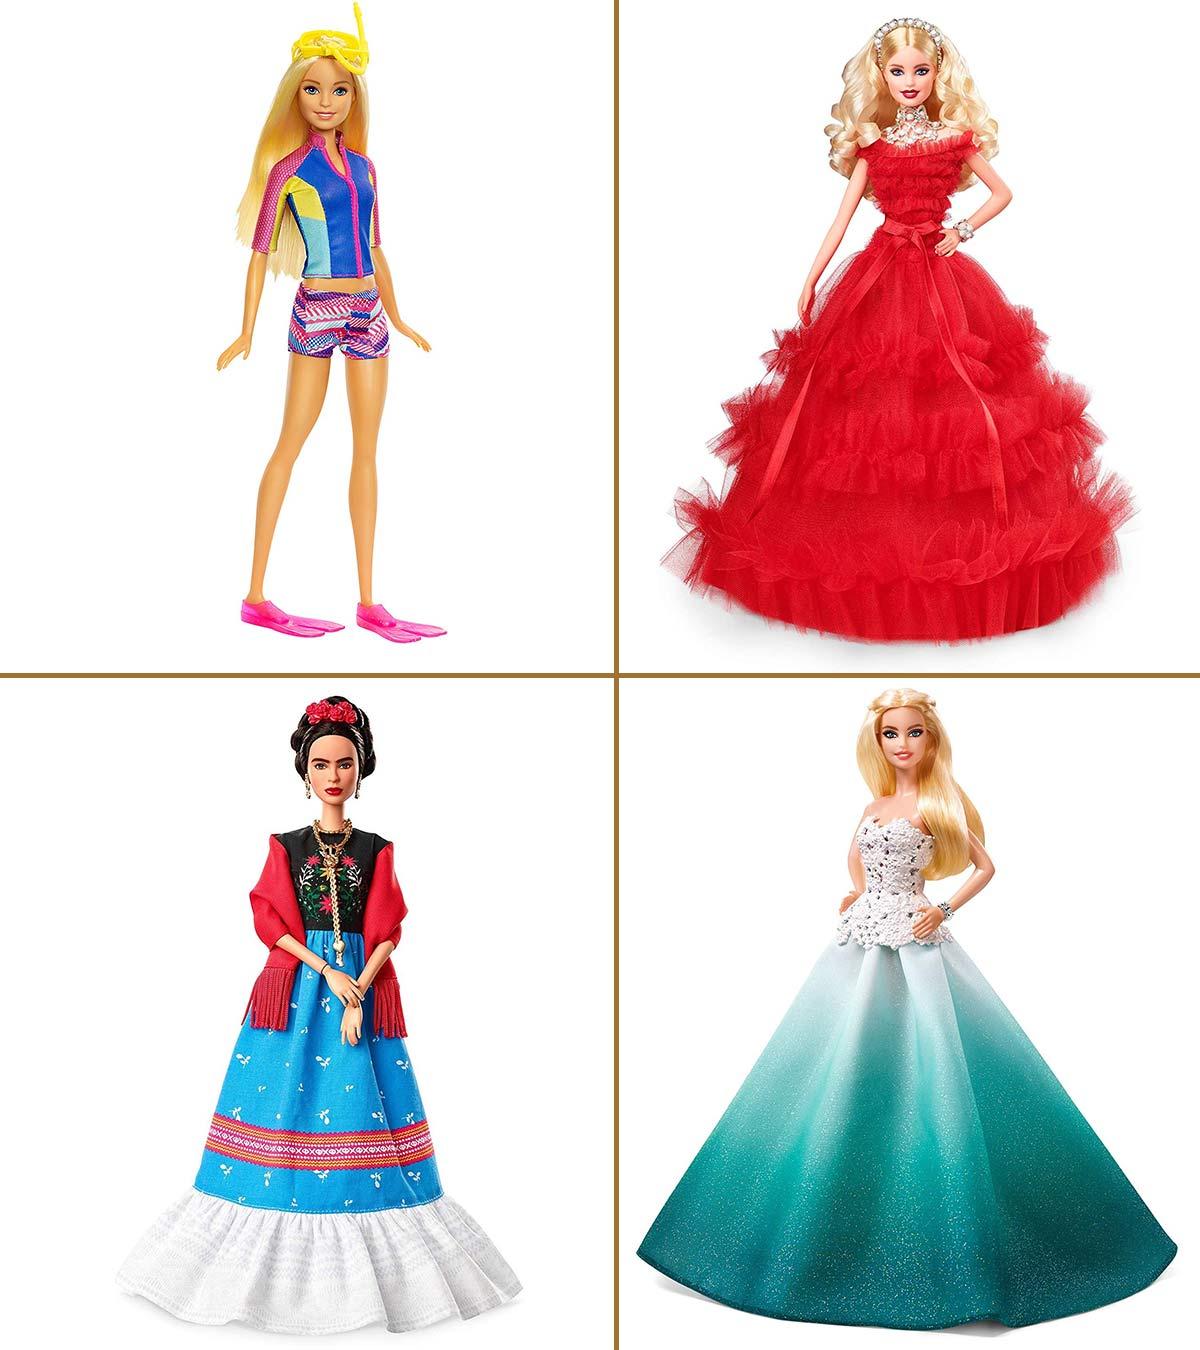 Lot Of Barbie doll SATIN dresses accessories 10 Mini Dresses Multi Colored New